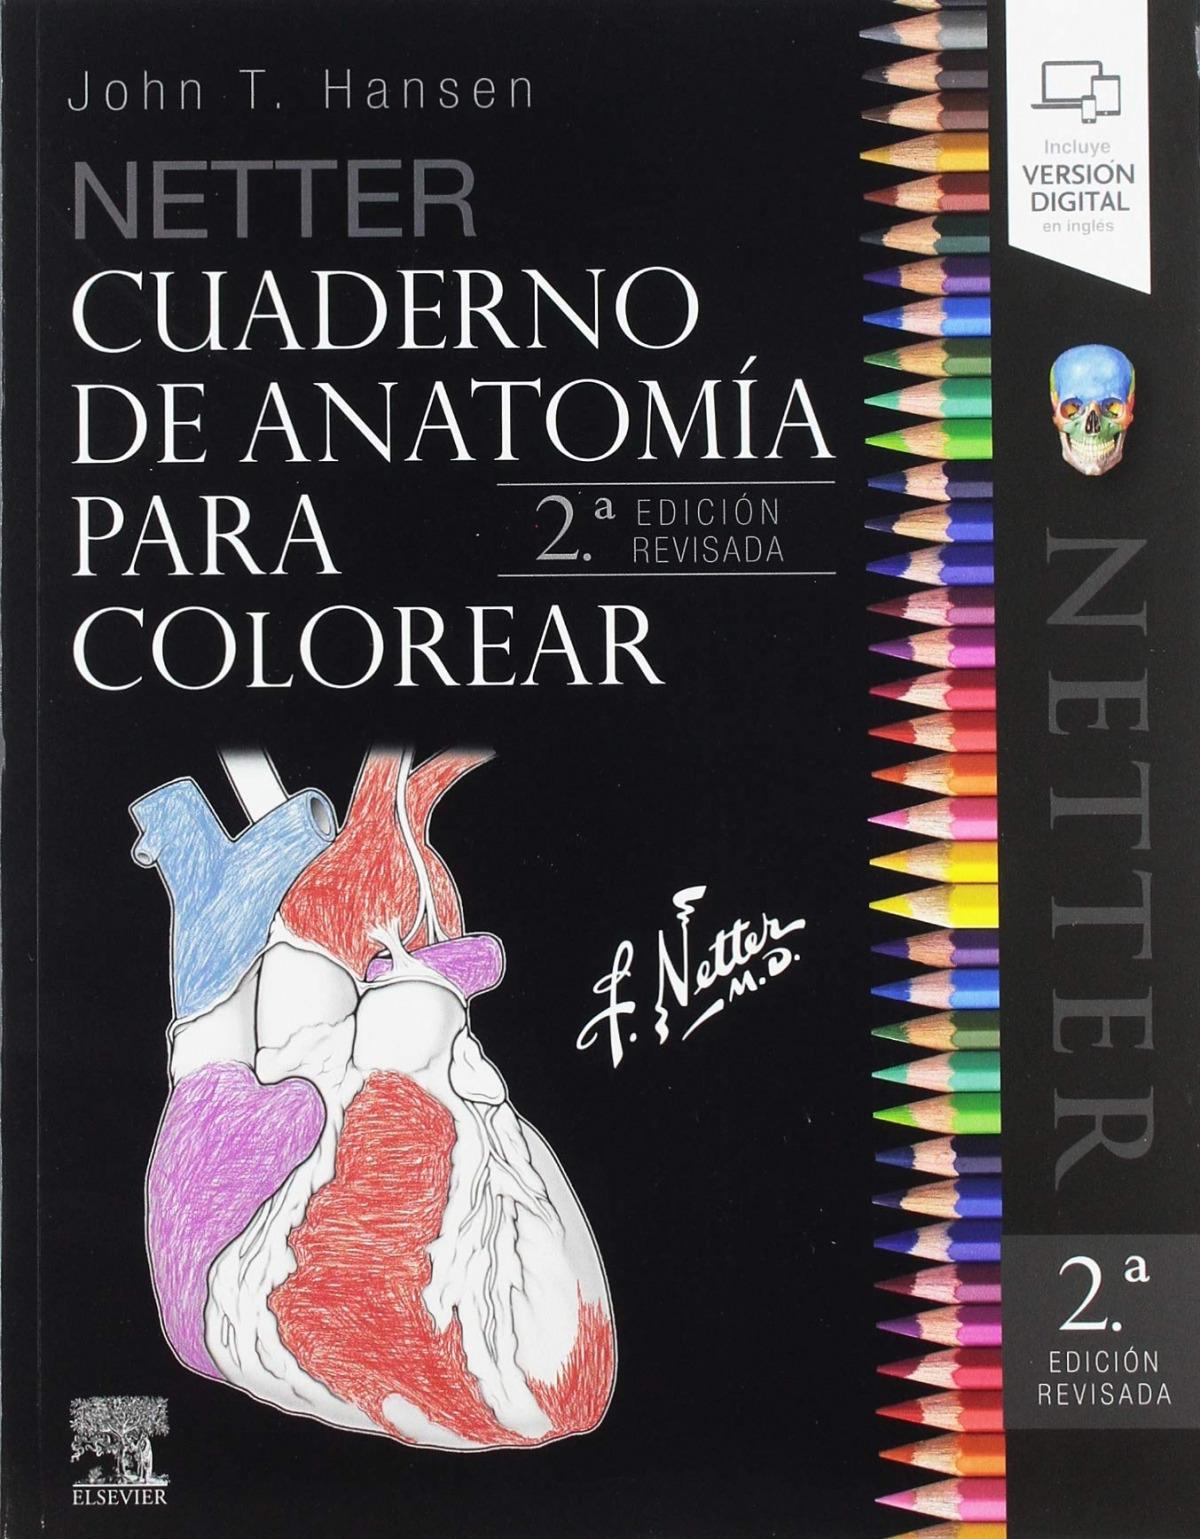 NETTER. CUADERNO DE ANATOMÍA PARA COLOREAR (2a.EDICIÓN REVISADA) 9788491134015